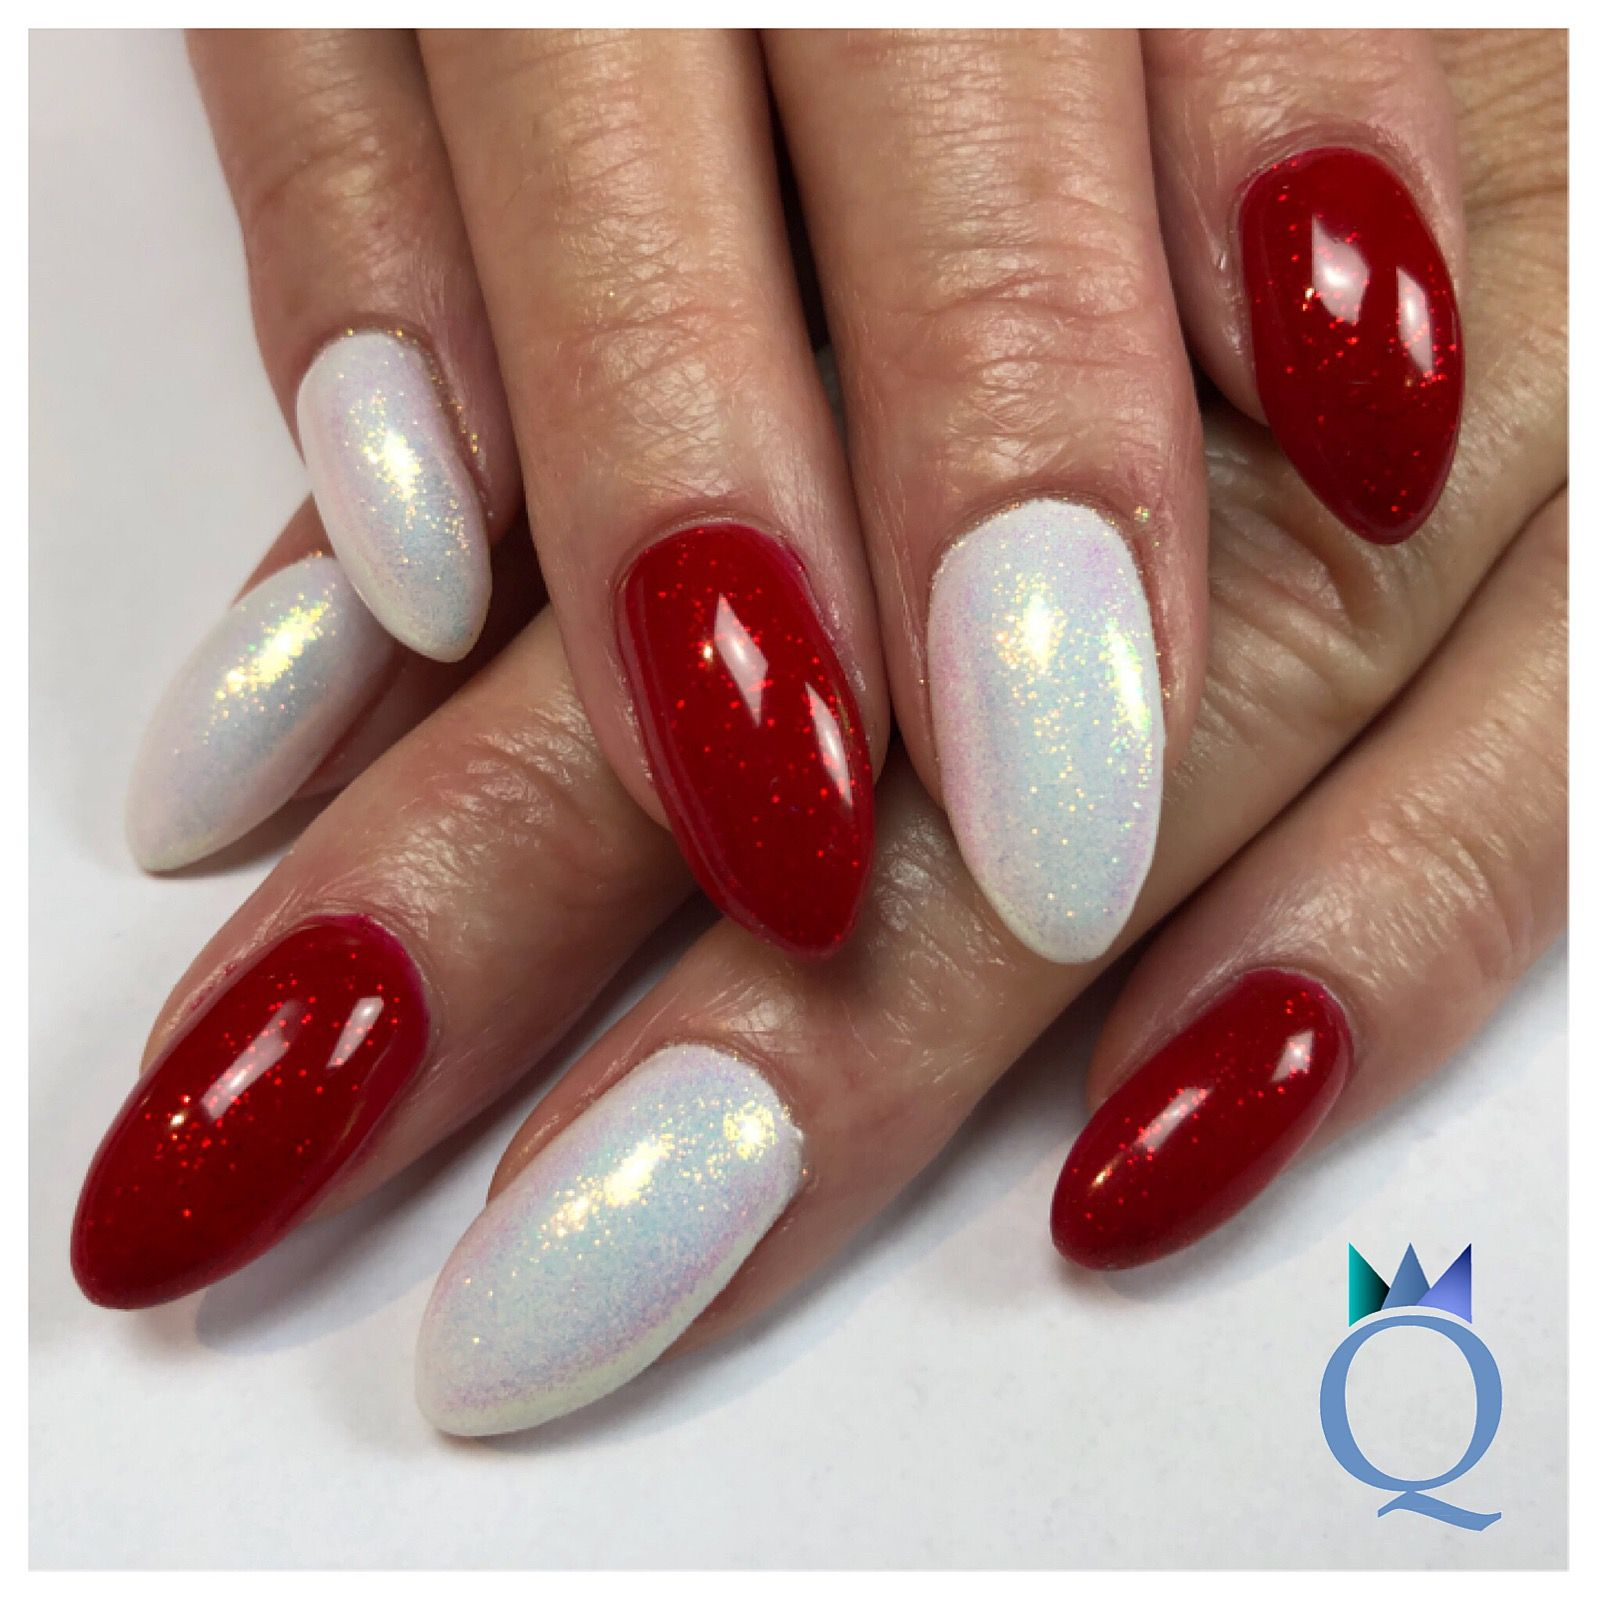 almondnails gelnails nails white red glitter mandelform geln gel n gel rot weiss. Black Bedroom Furniture Sets. Home Design Ideas